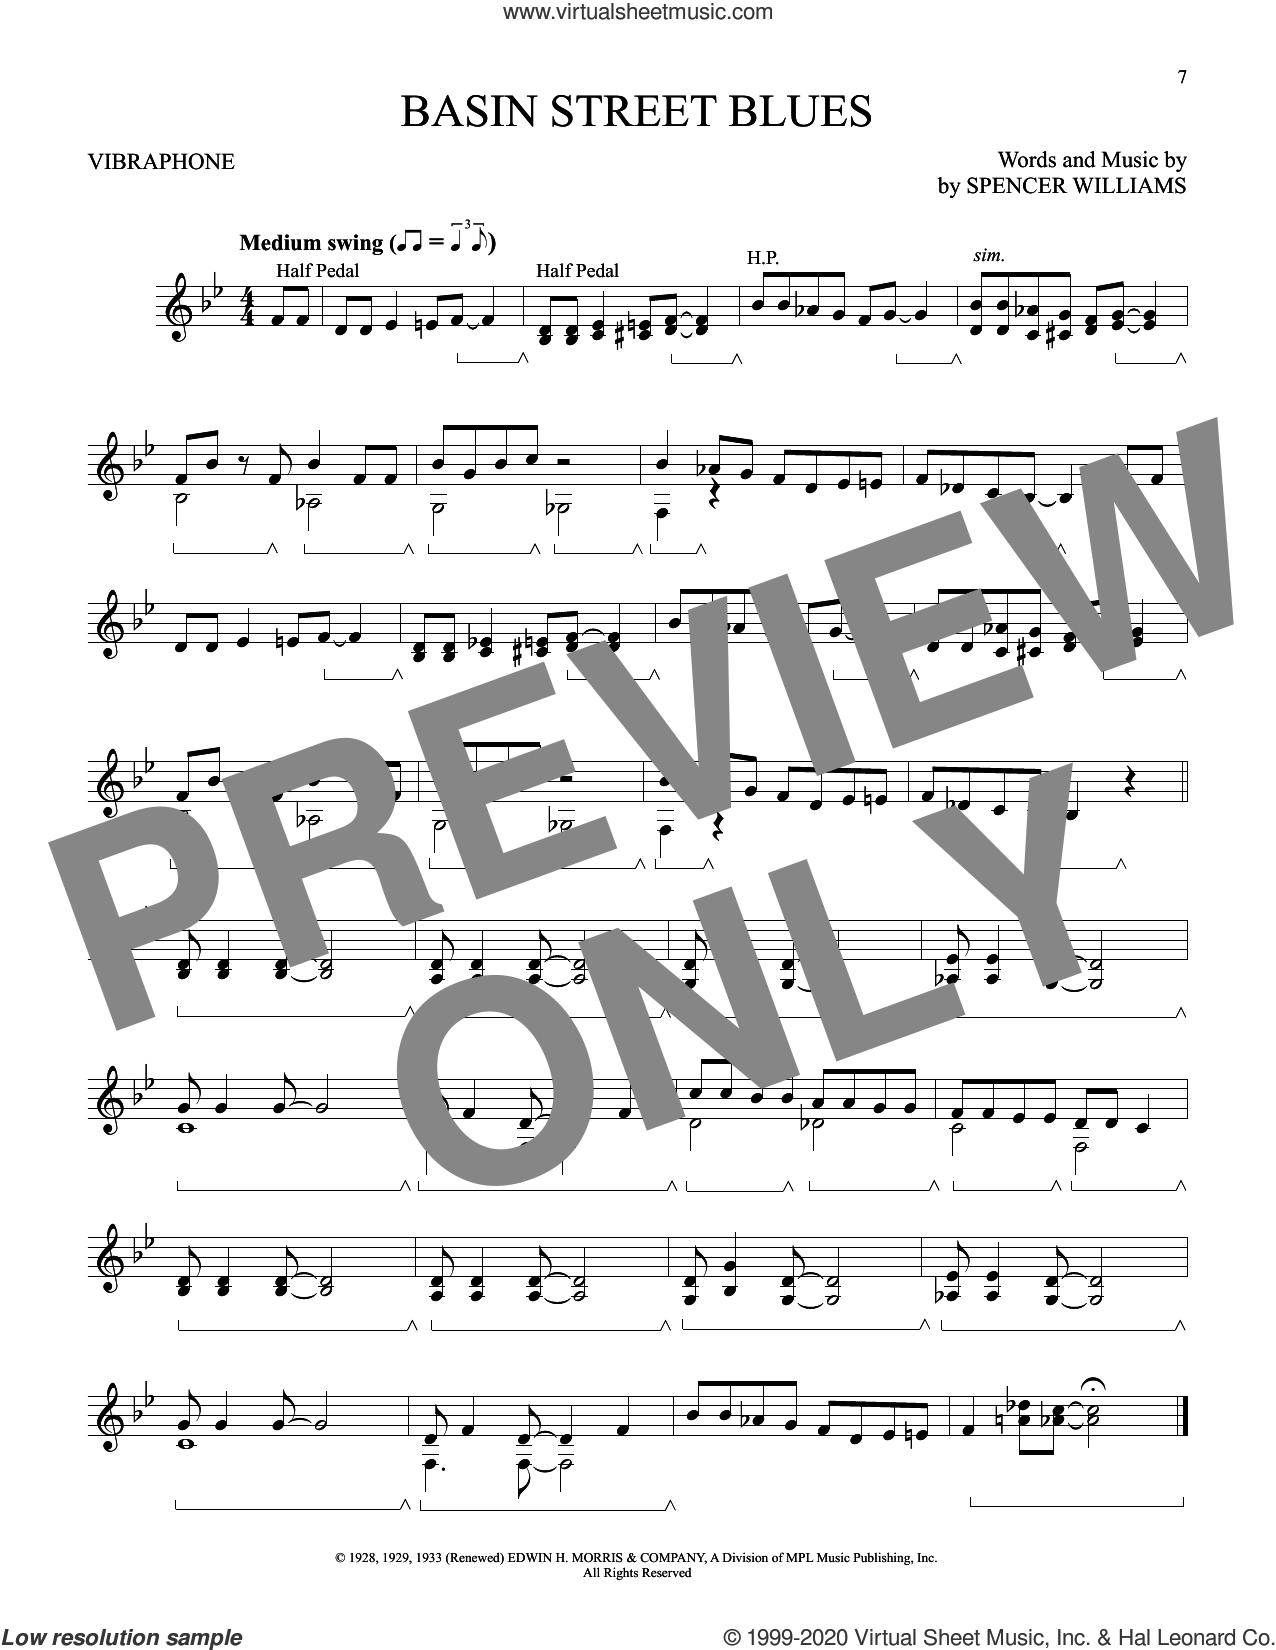 Basin Street Blues sheet music for Vibraphone Solo by Spencer Williams, intermediate skill level